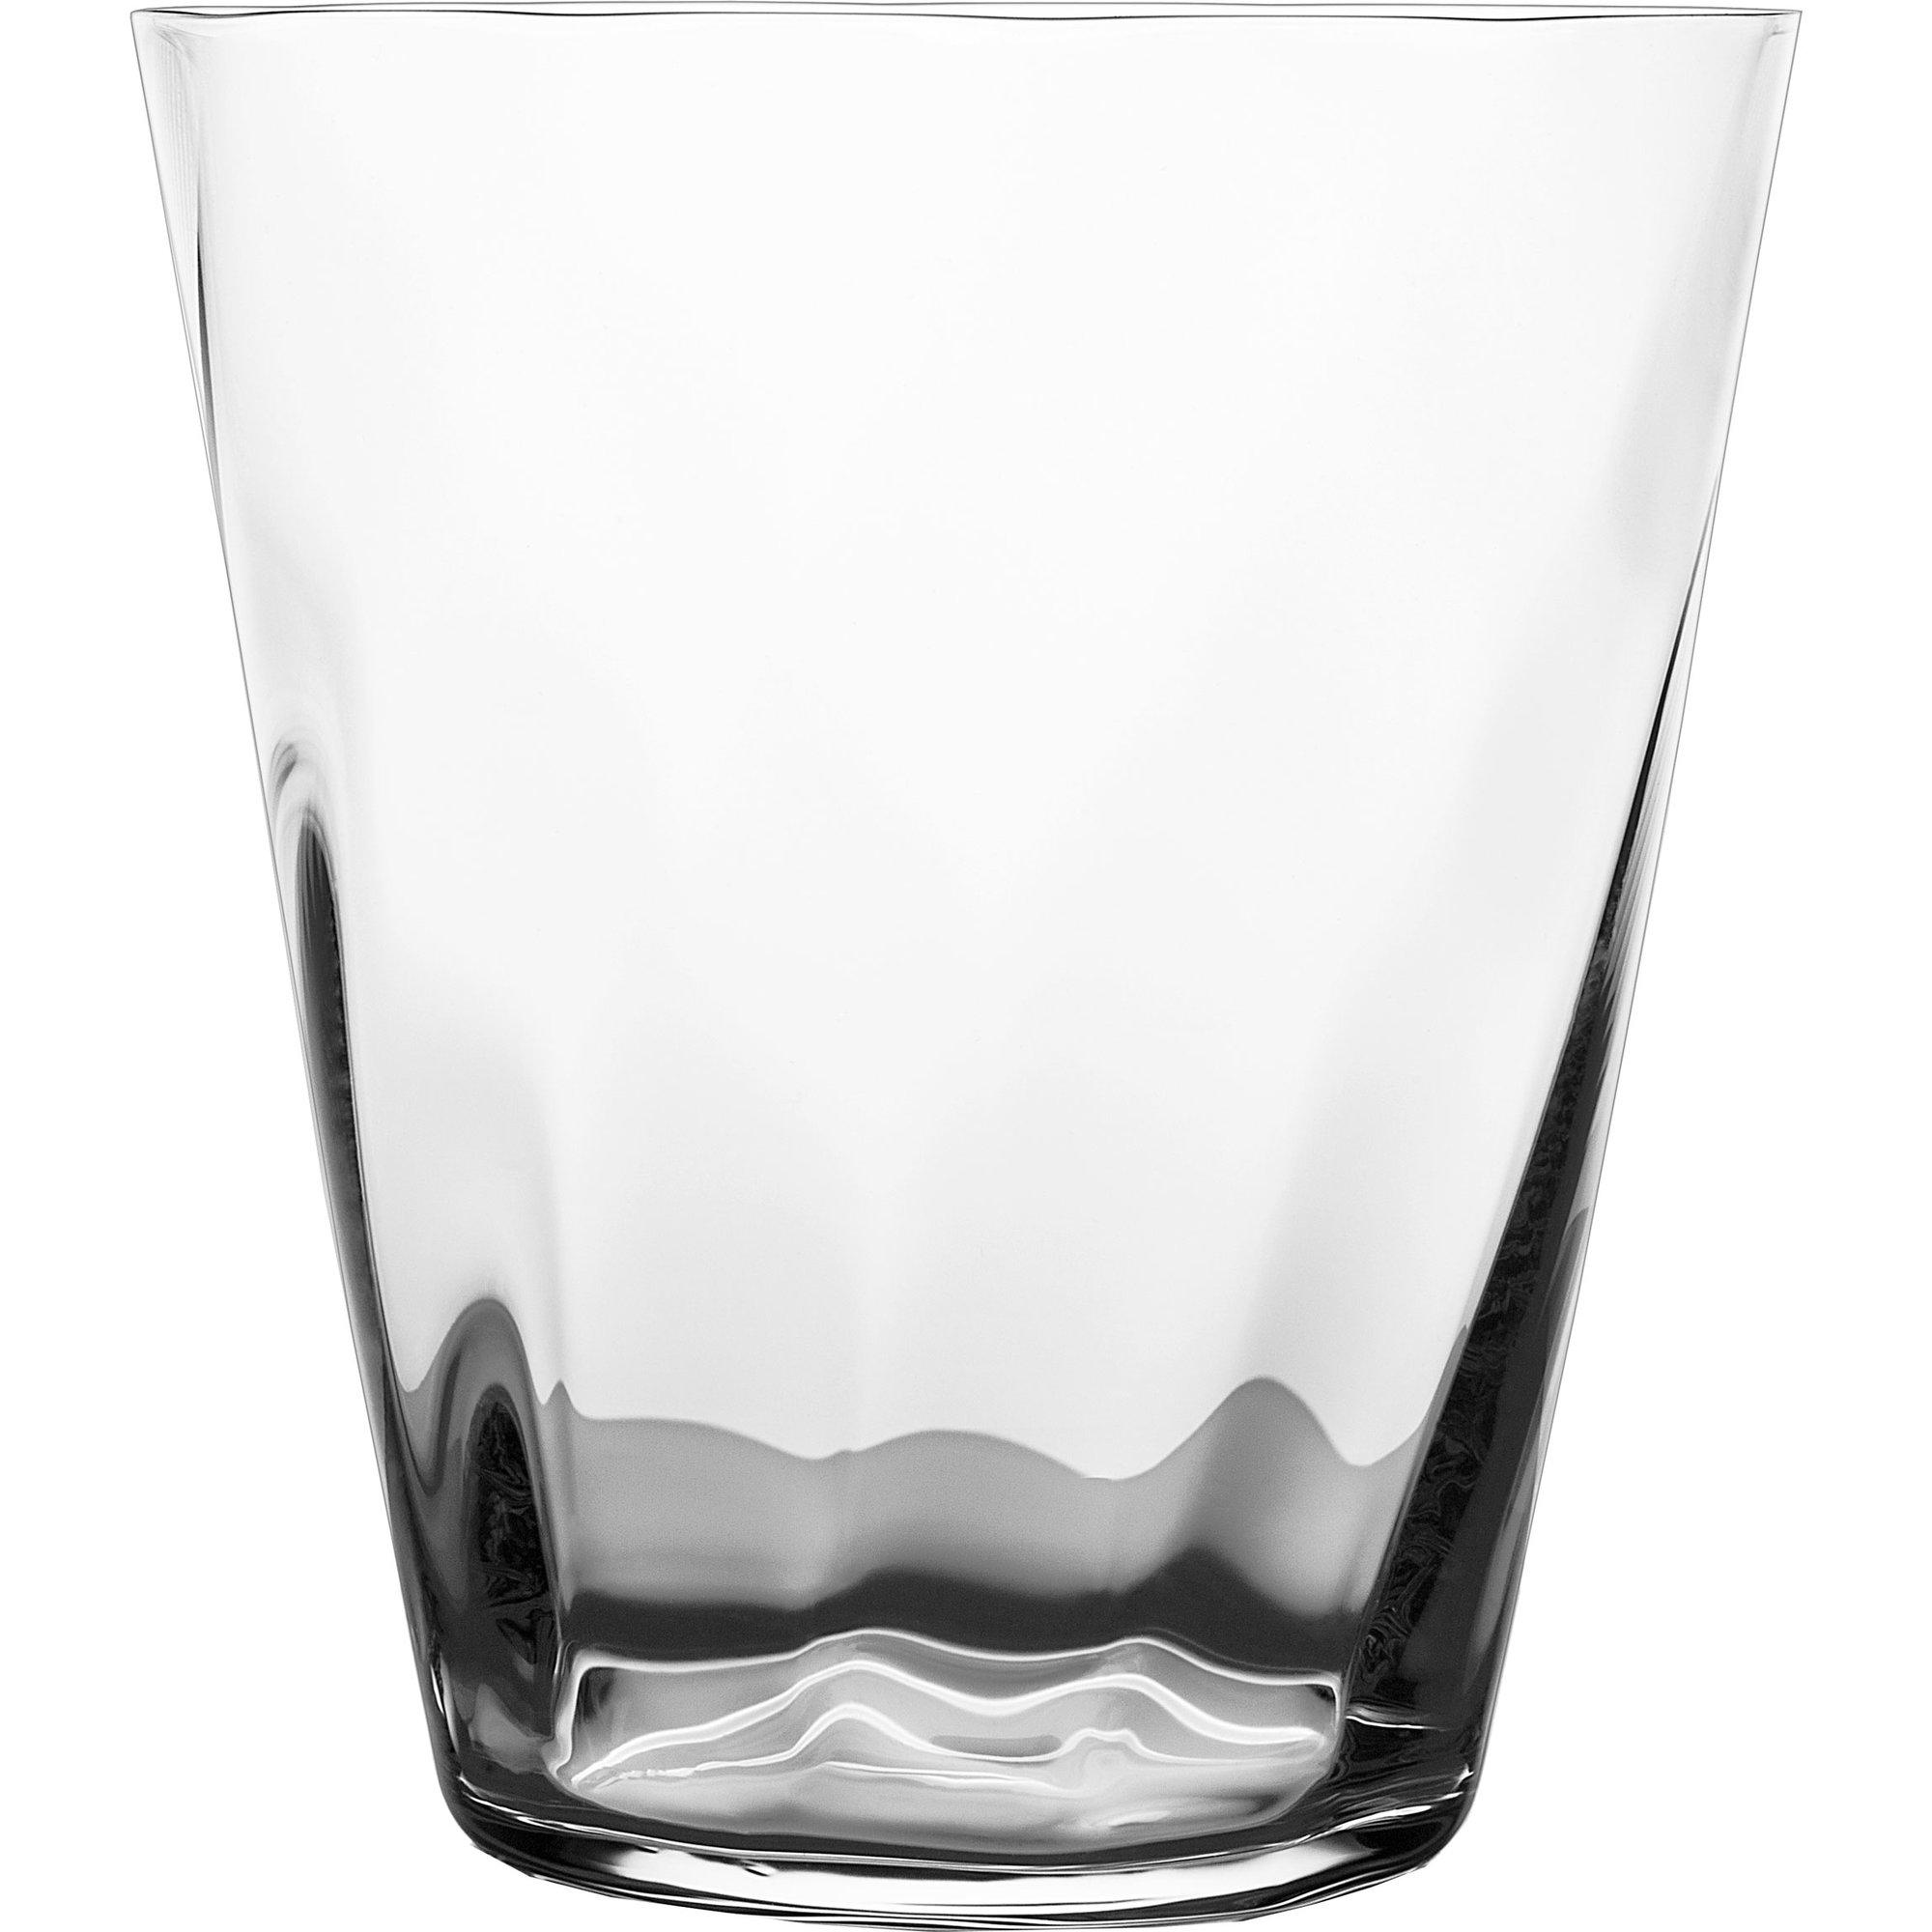 Zalto Coupe Effect vattenglas 380 ml. 1 st.